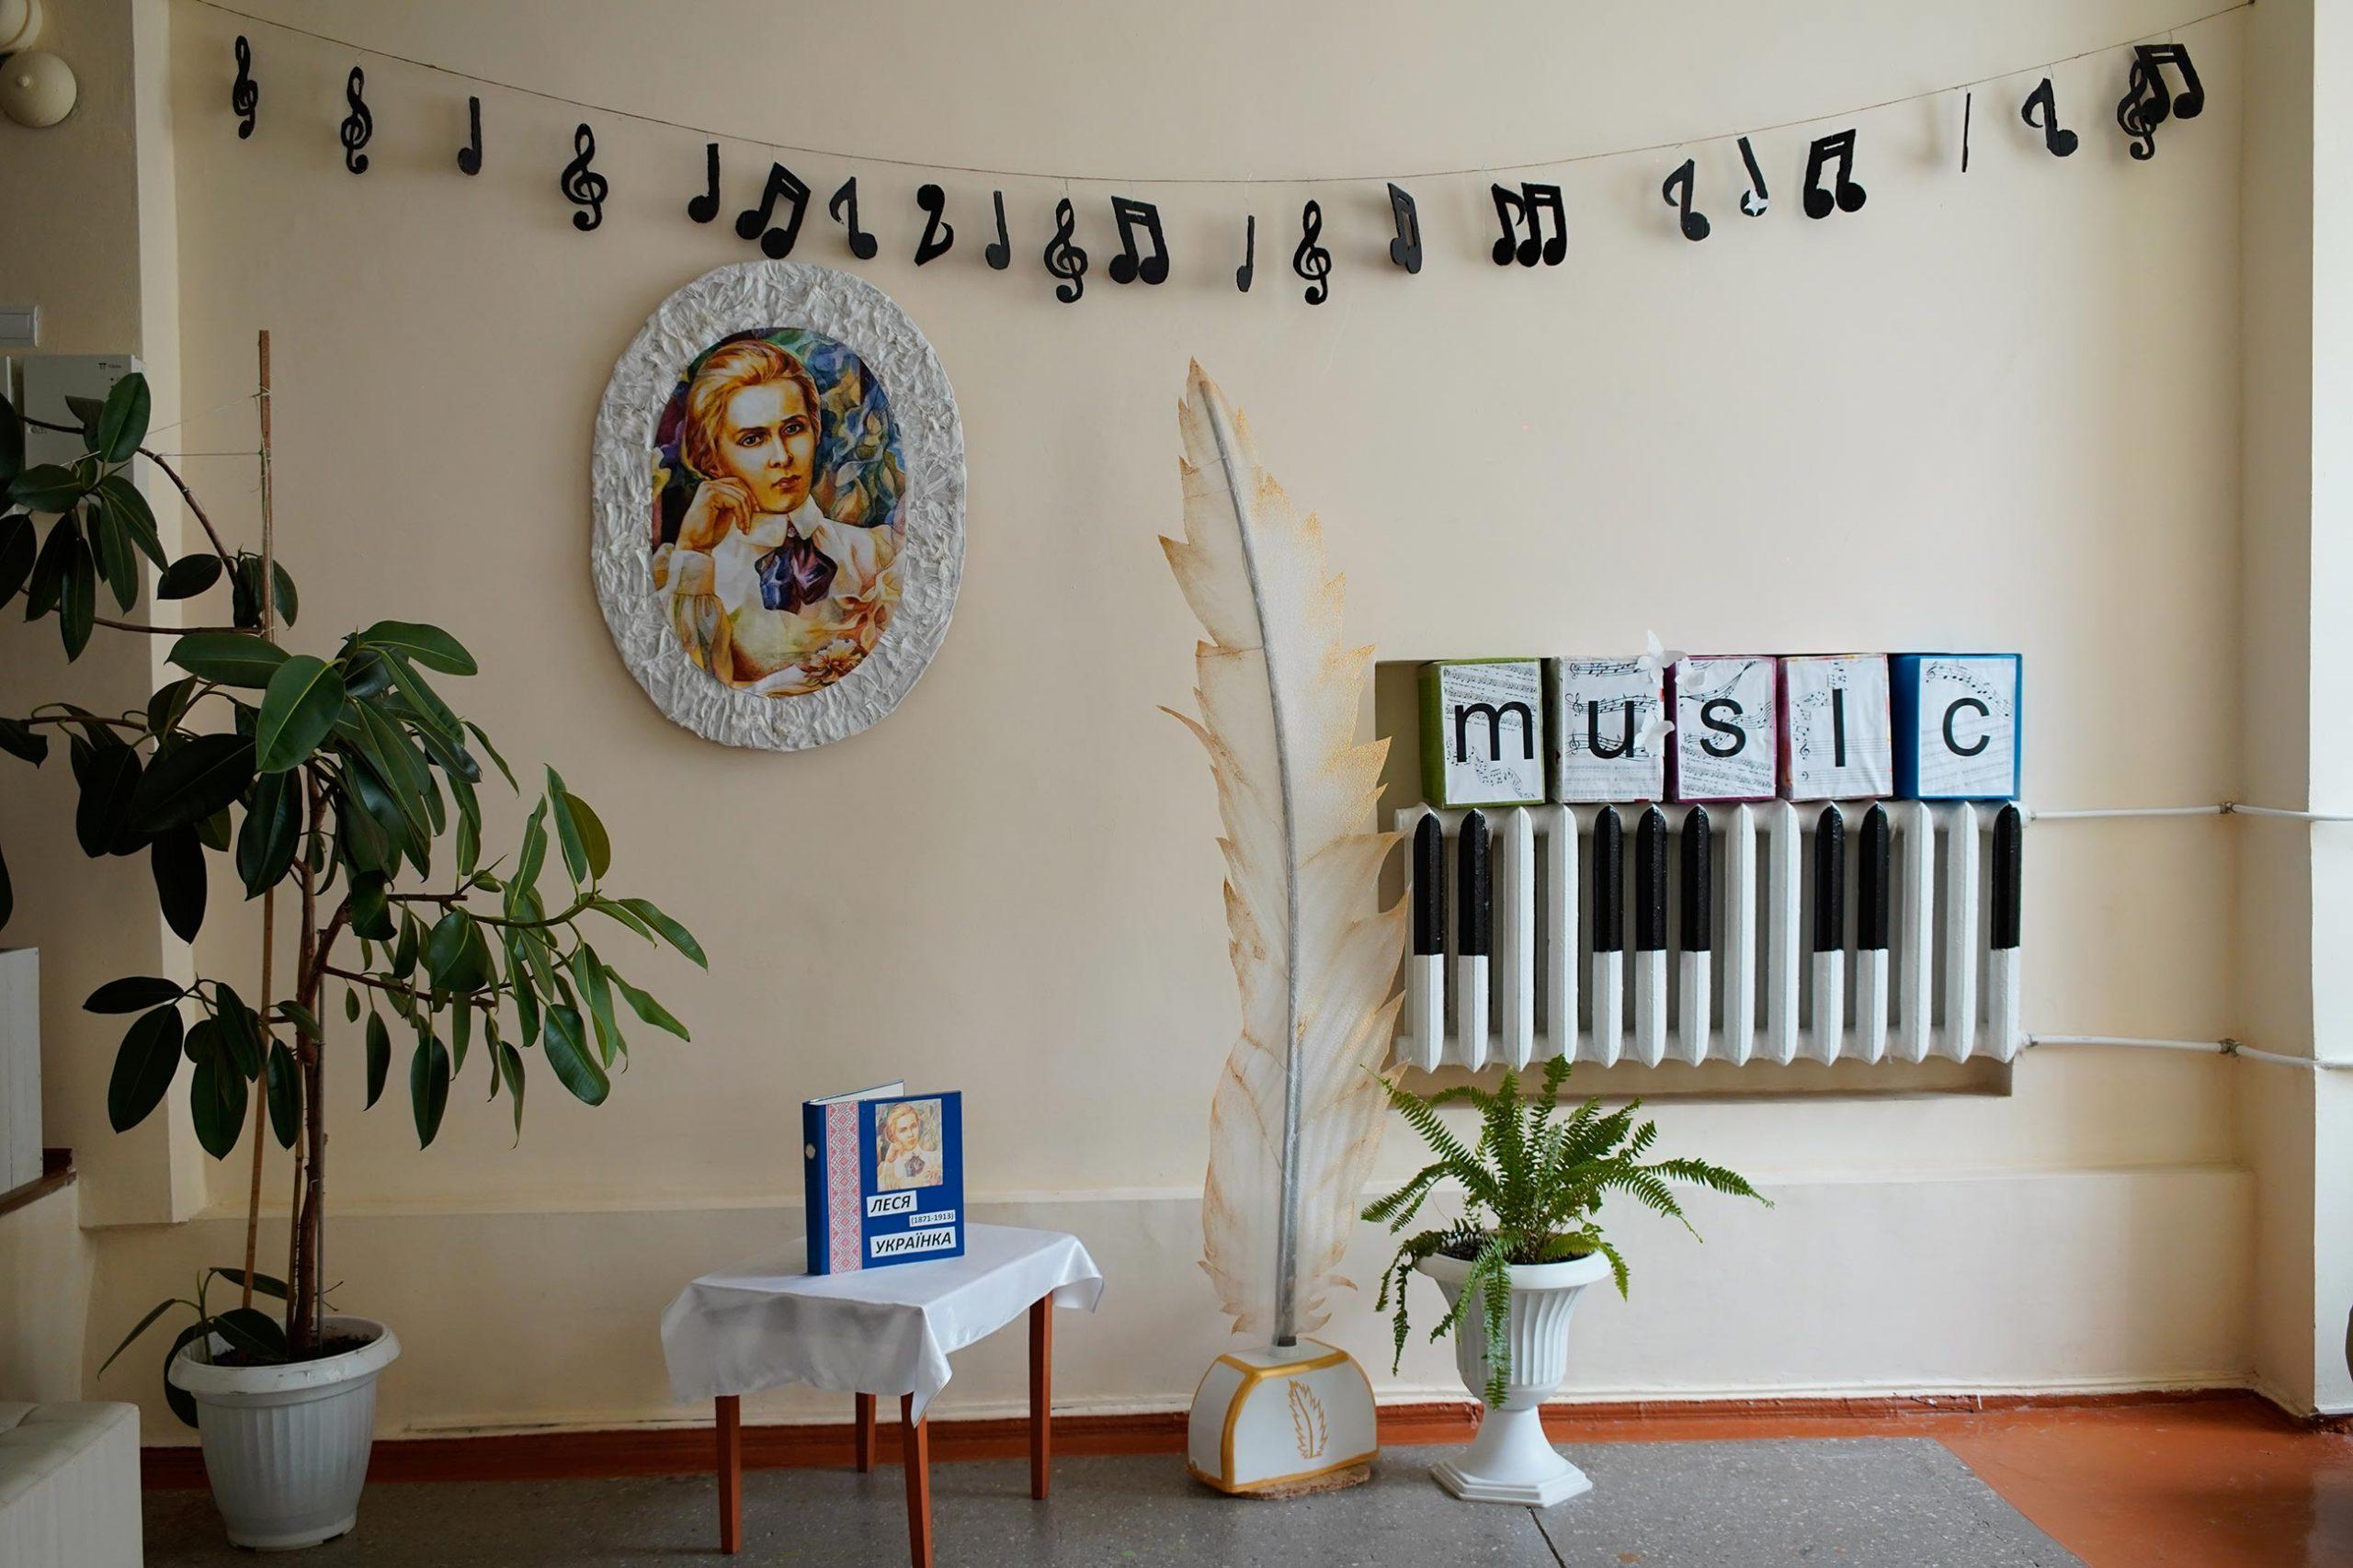 tch7476 scaled - <b>Музыка для Лизы.</b> Как пианистка с синдромом Дауна и ее мама борются за право на образование - Заборона